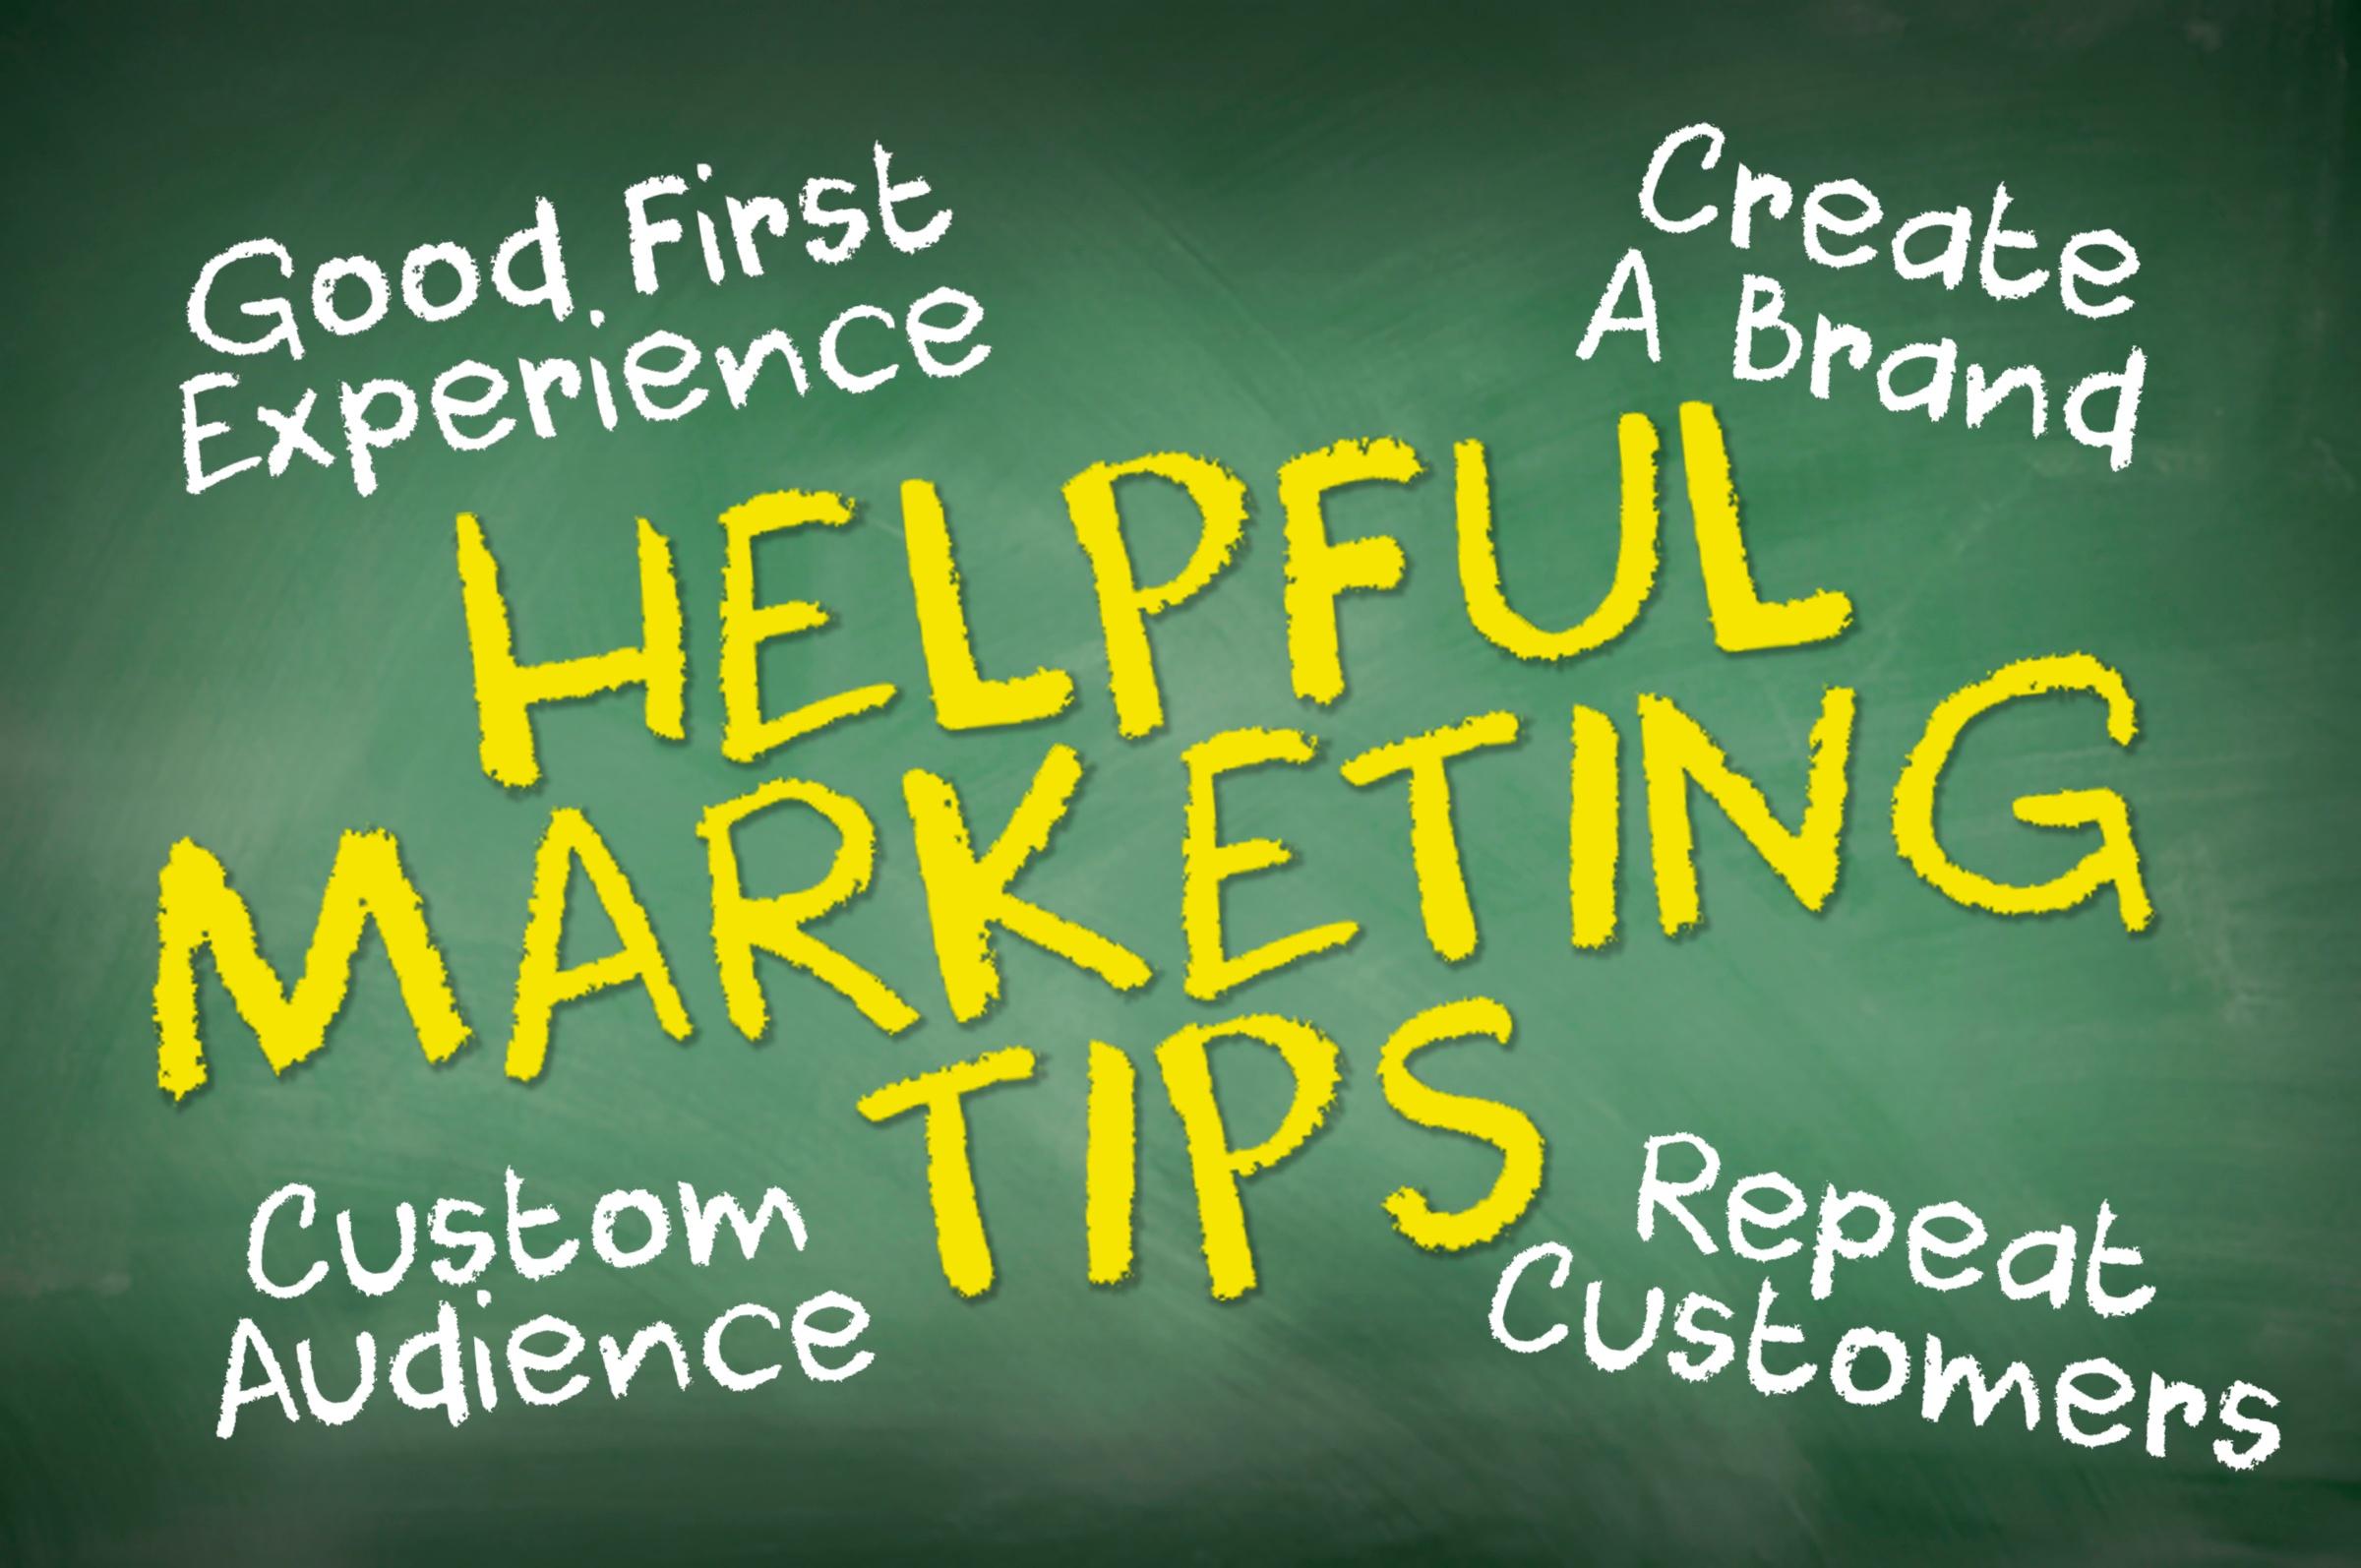 Helpful-Marketing-Tips